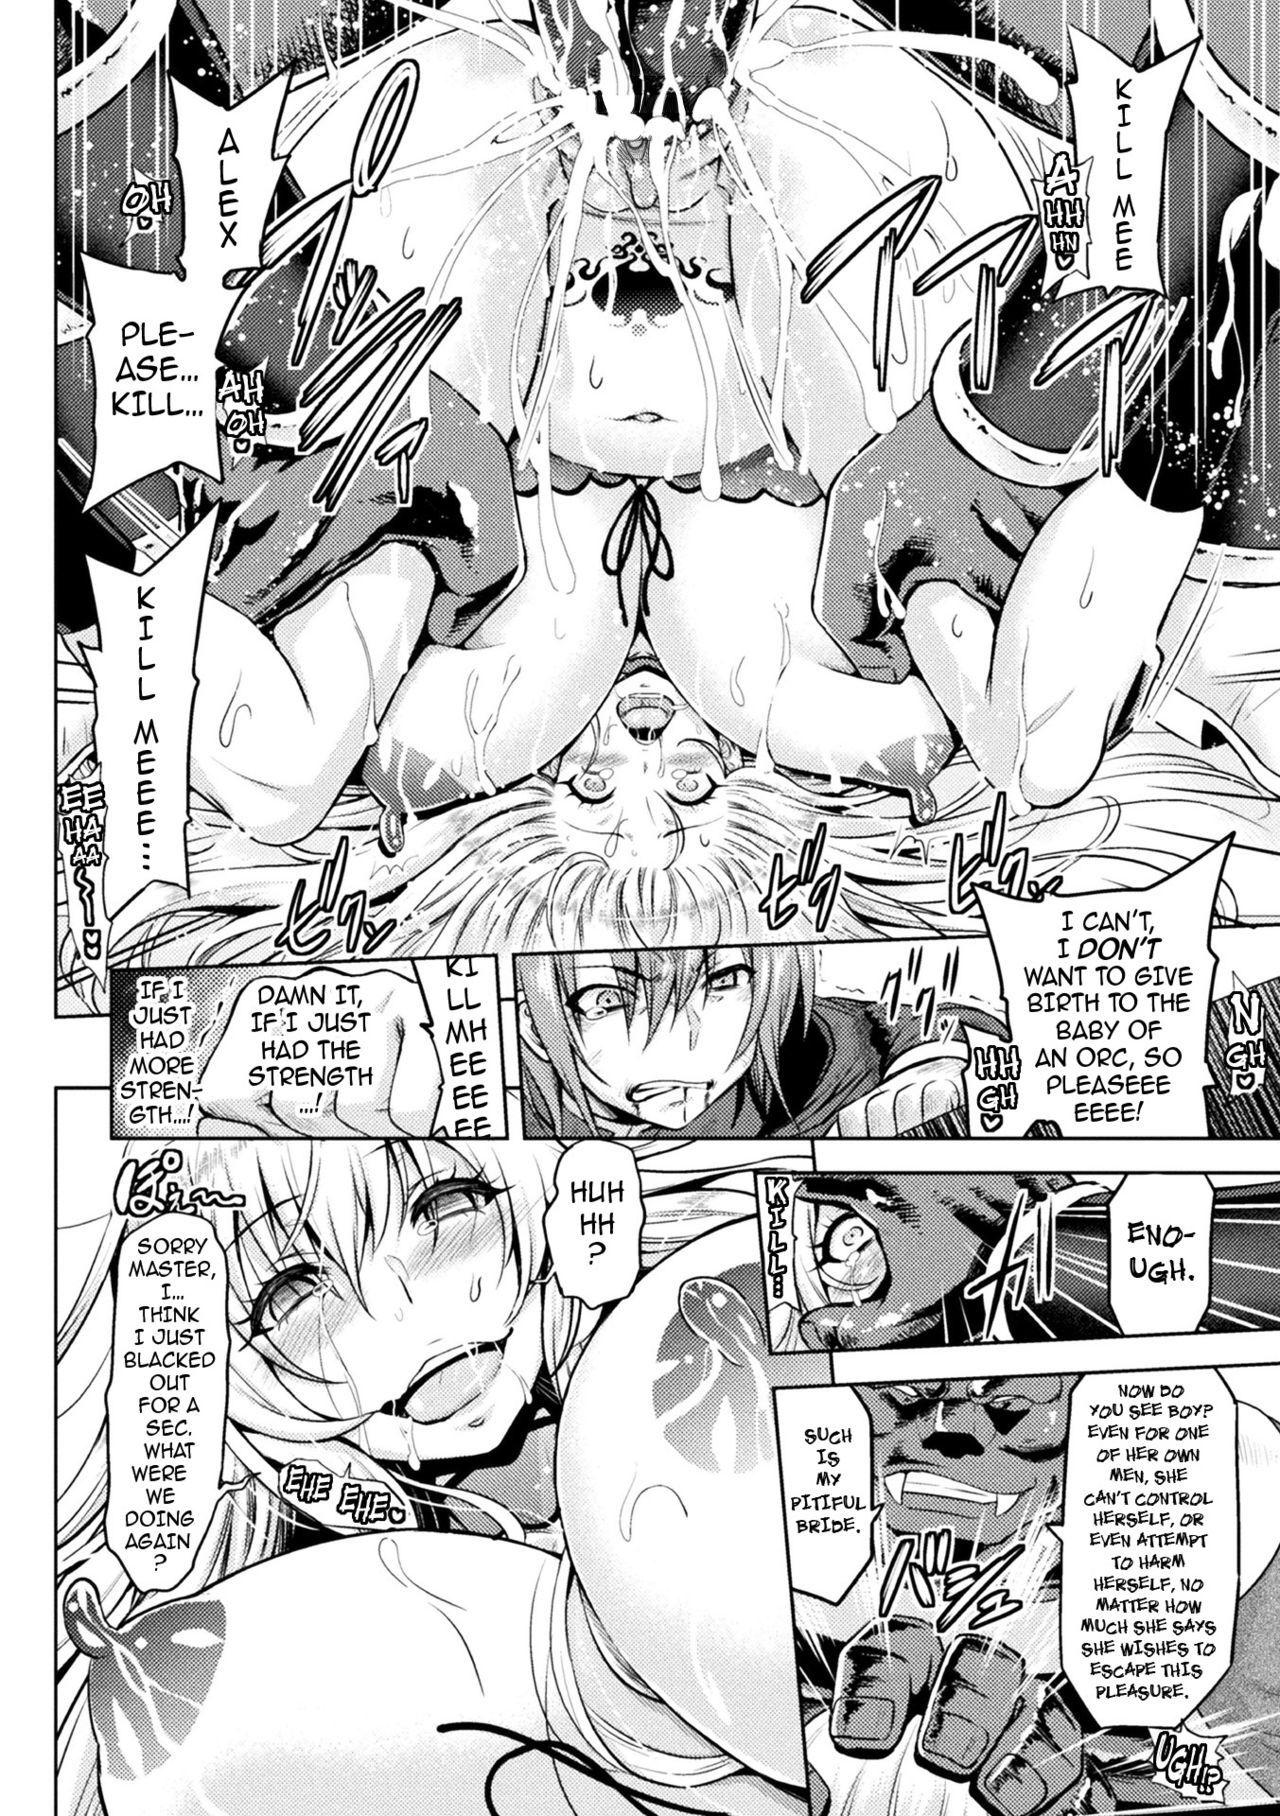 [Yamada Gogogo] Erona ~Orc no Inmon ni Okasareta Onna Kishi no Matsuro~ | Erona ~The Fall of a Beautiful Knight Cursed with the Lewd Mark of an Orc~ Ch. 1-6 [English] [darknight] [Decensored] [ongoing] 121